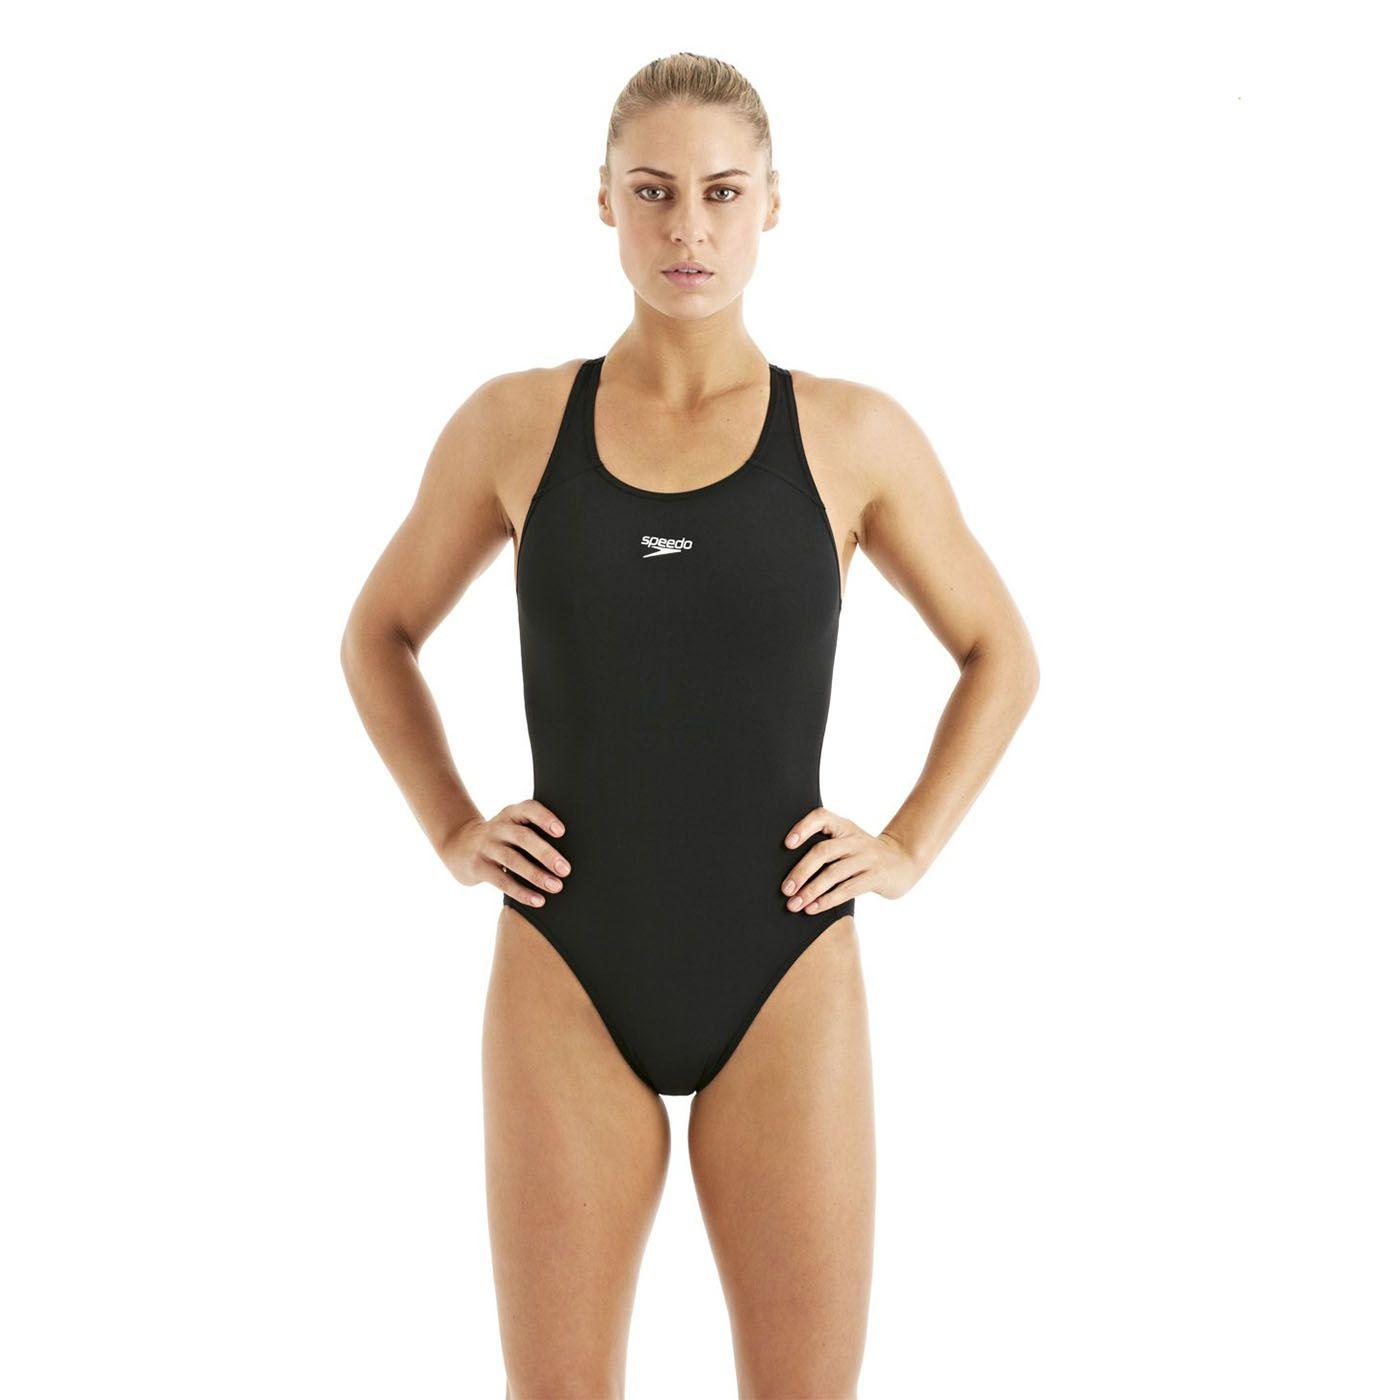 Speedo Endurance Plus Racerback Ladies Swimsuit ...